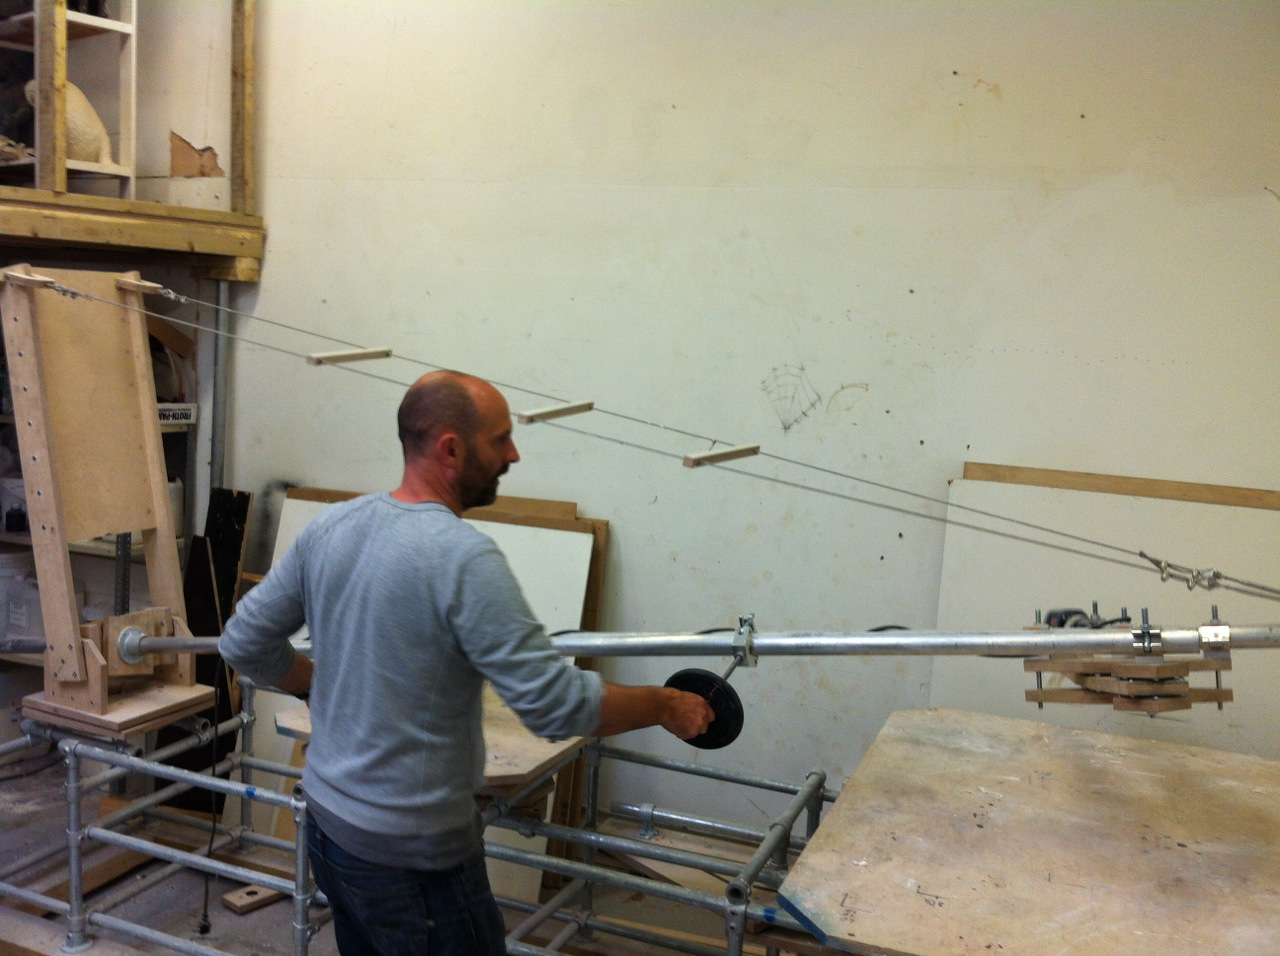 eds machine shop